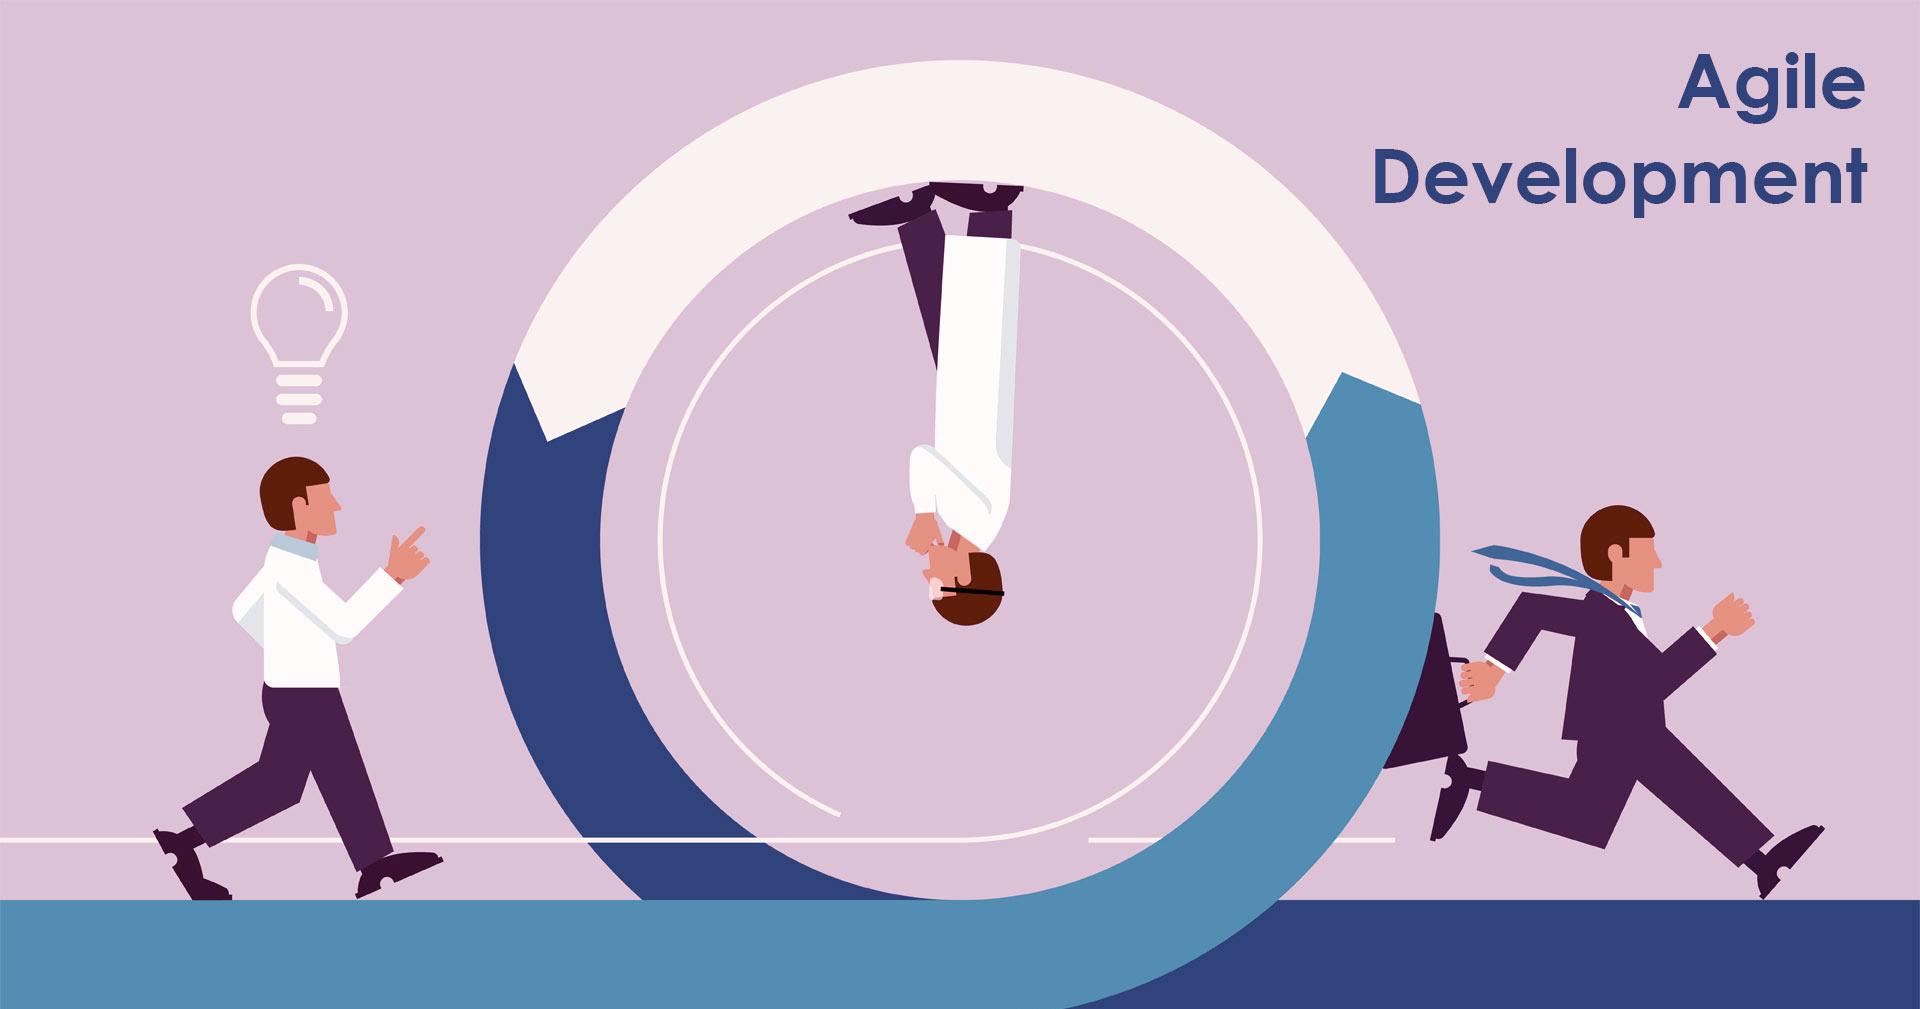 Agile Development – Precision and Flexibility Together